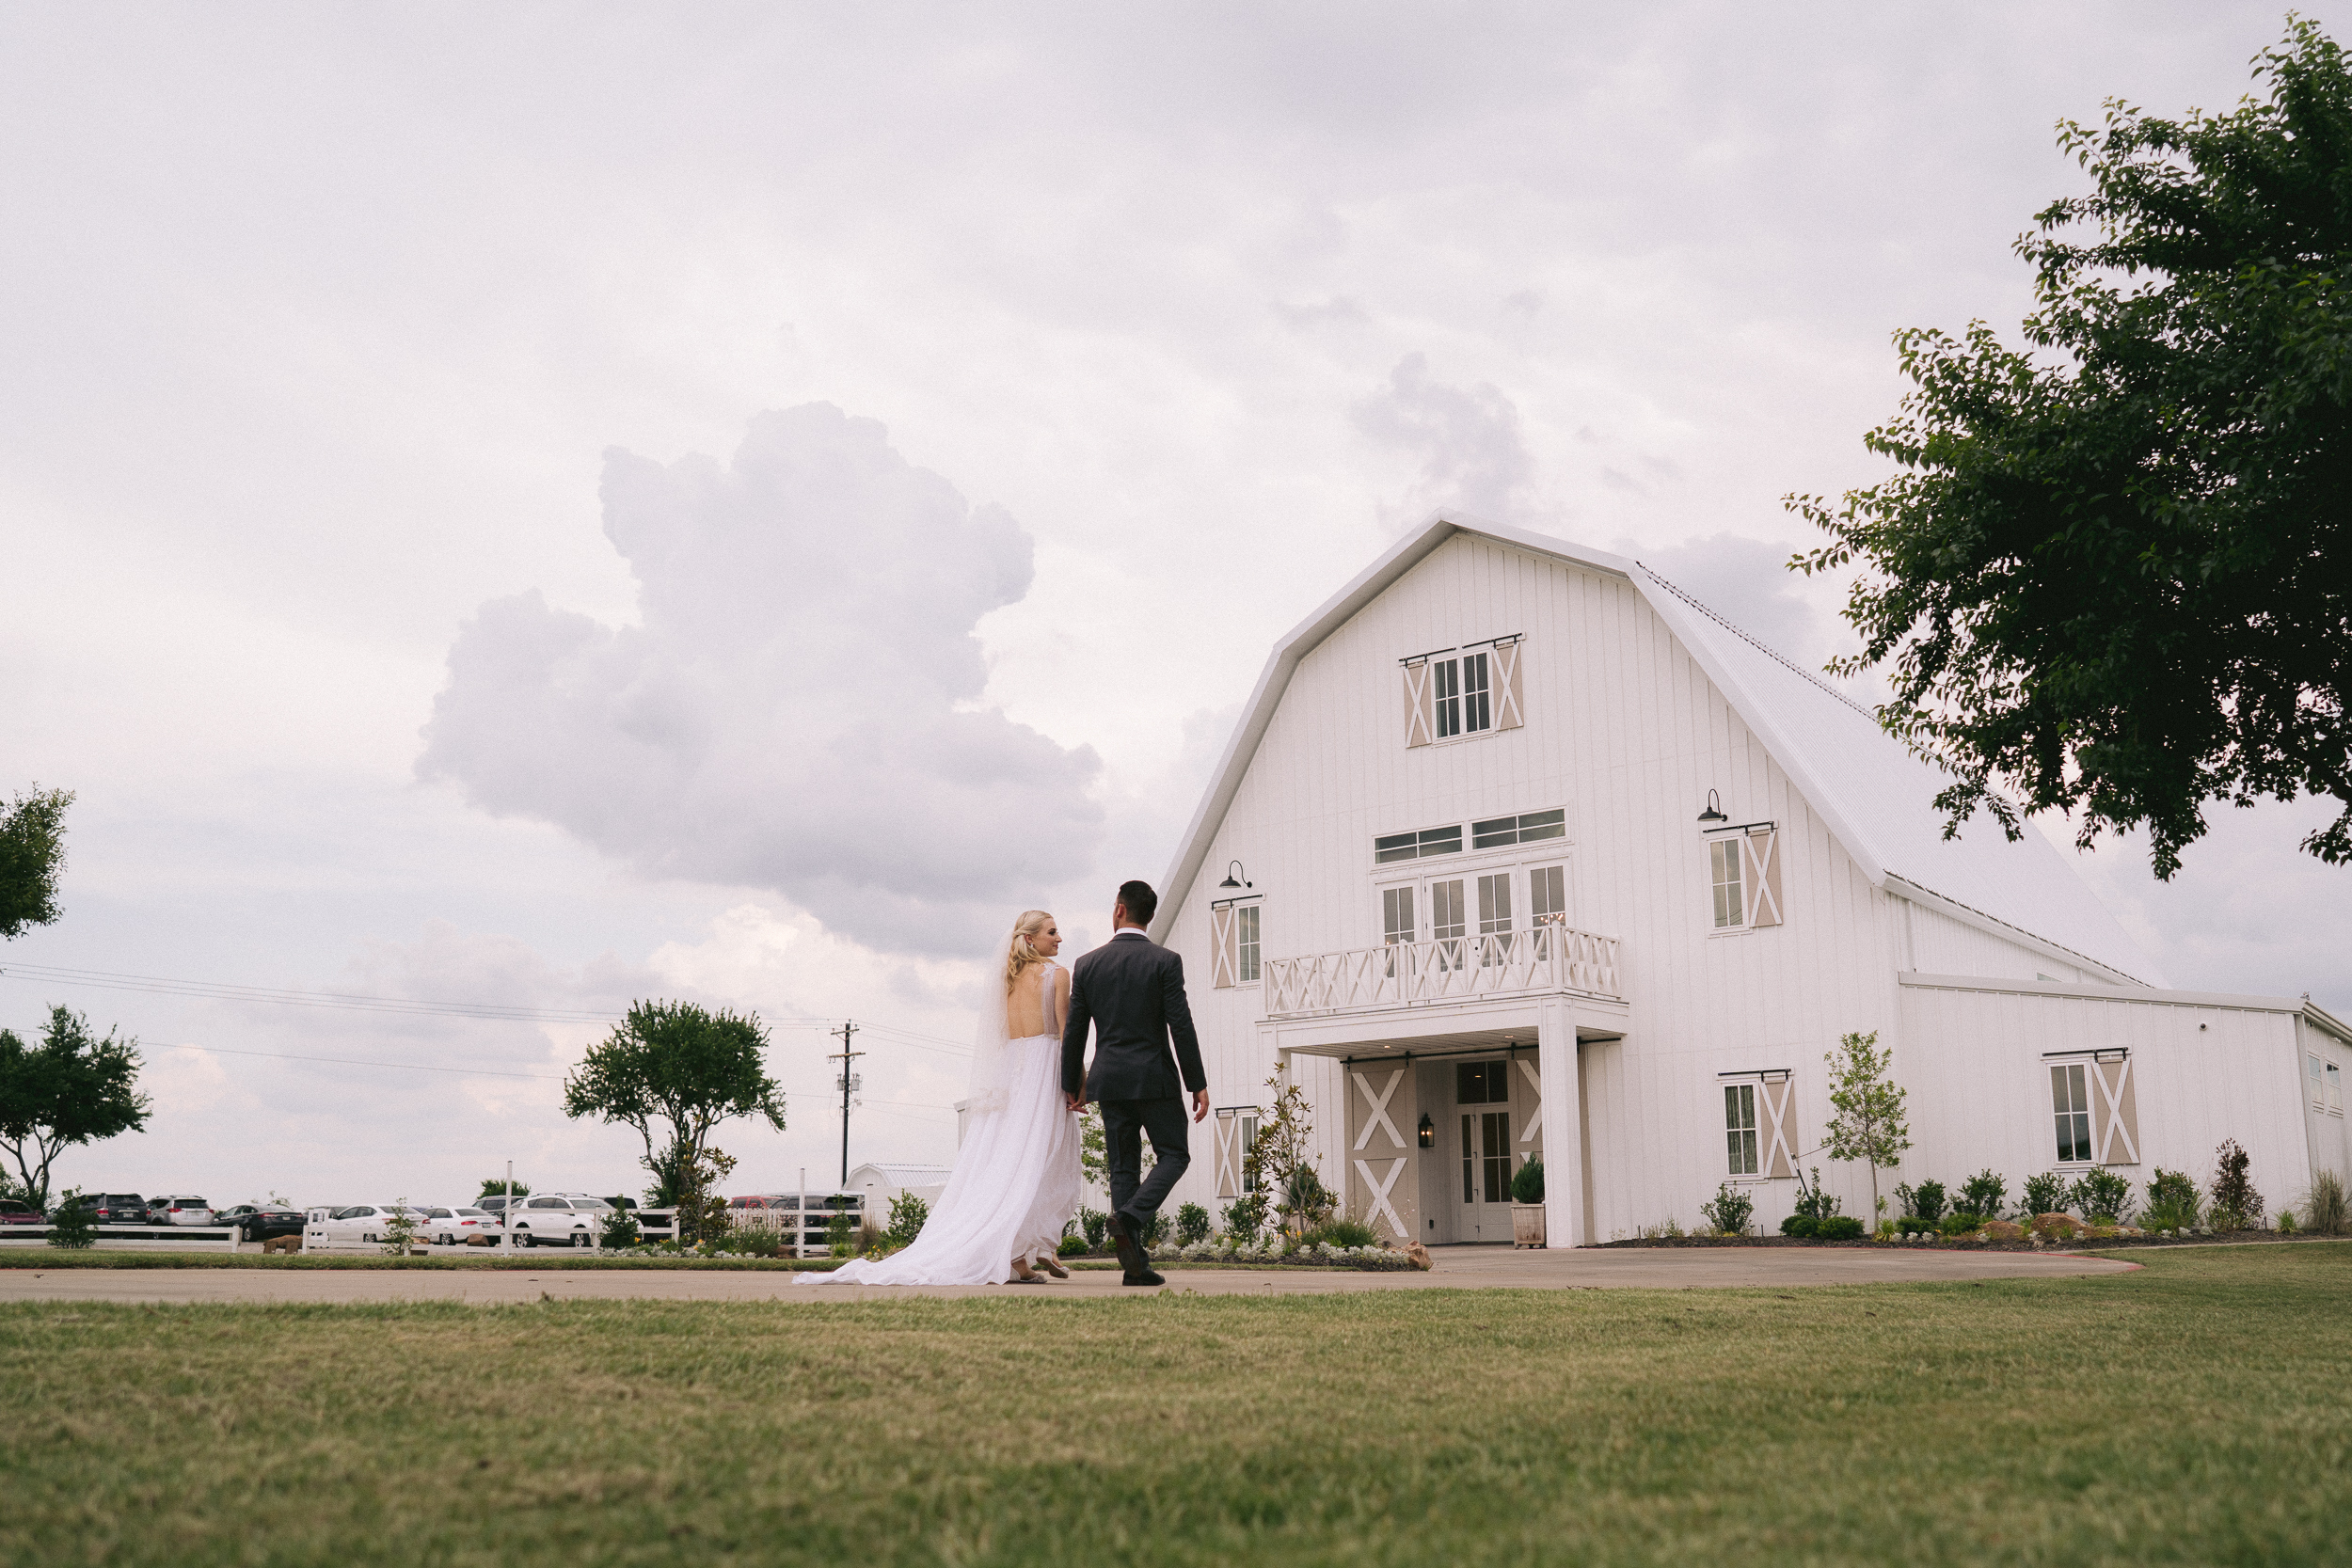 engagement-wedding-photographer-Dallas-Before-2.jpg